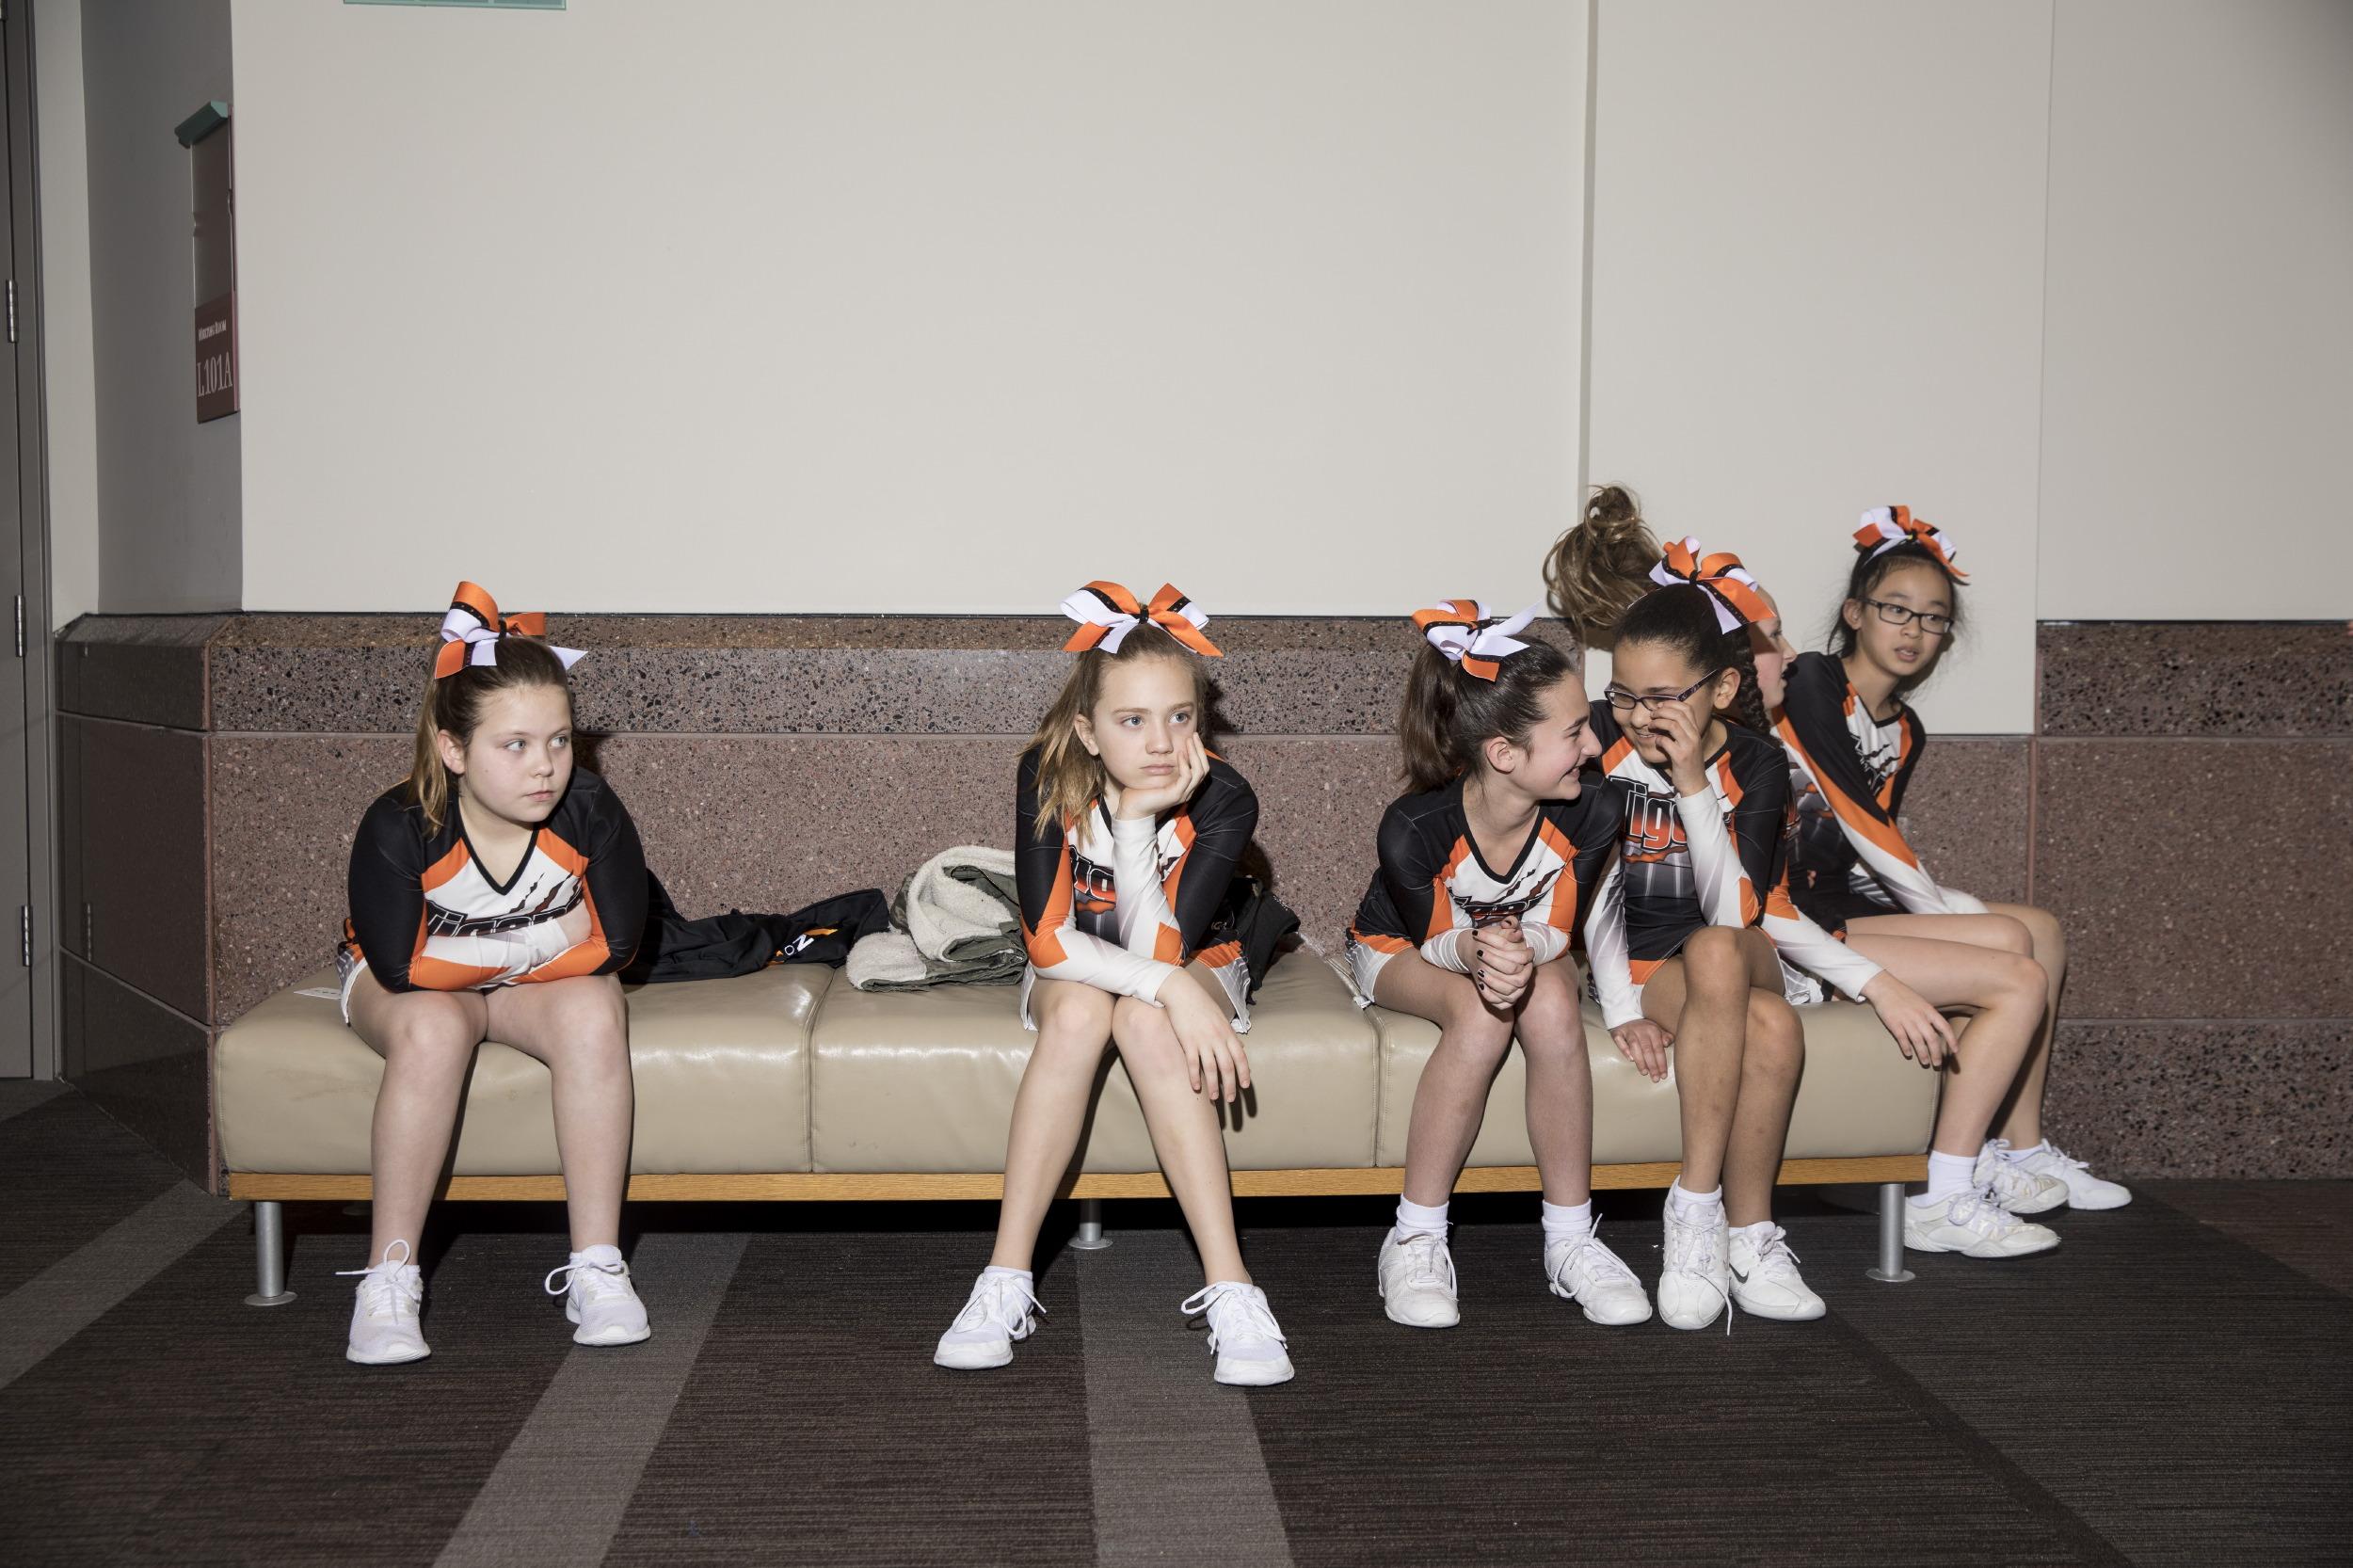 170204_Cheerleading_00213T.JPG